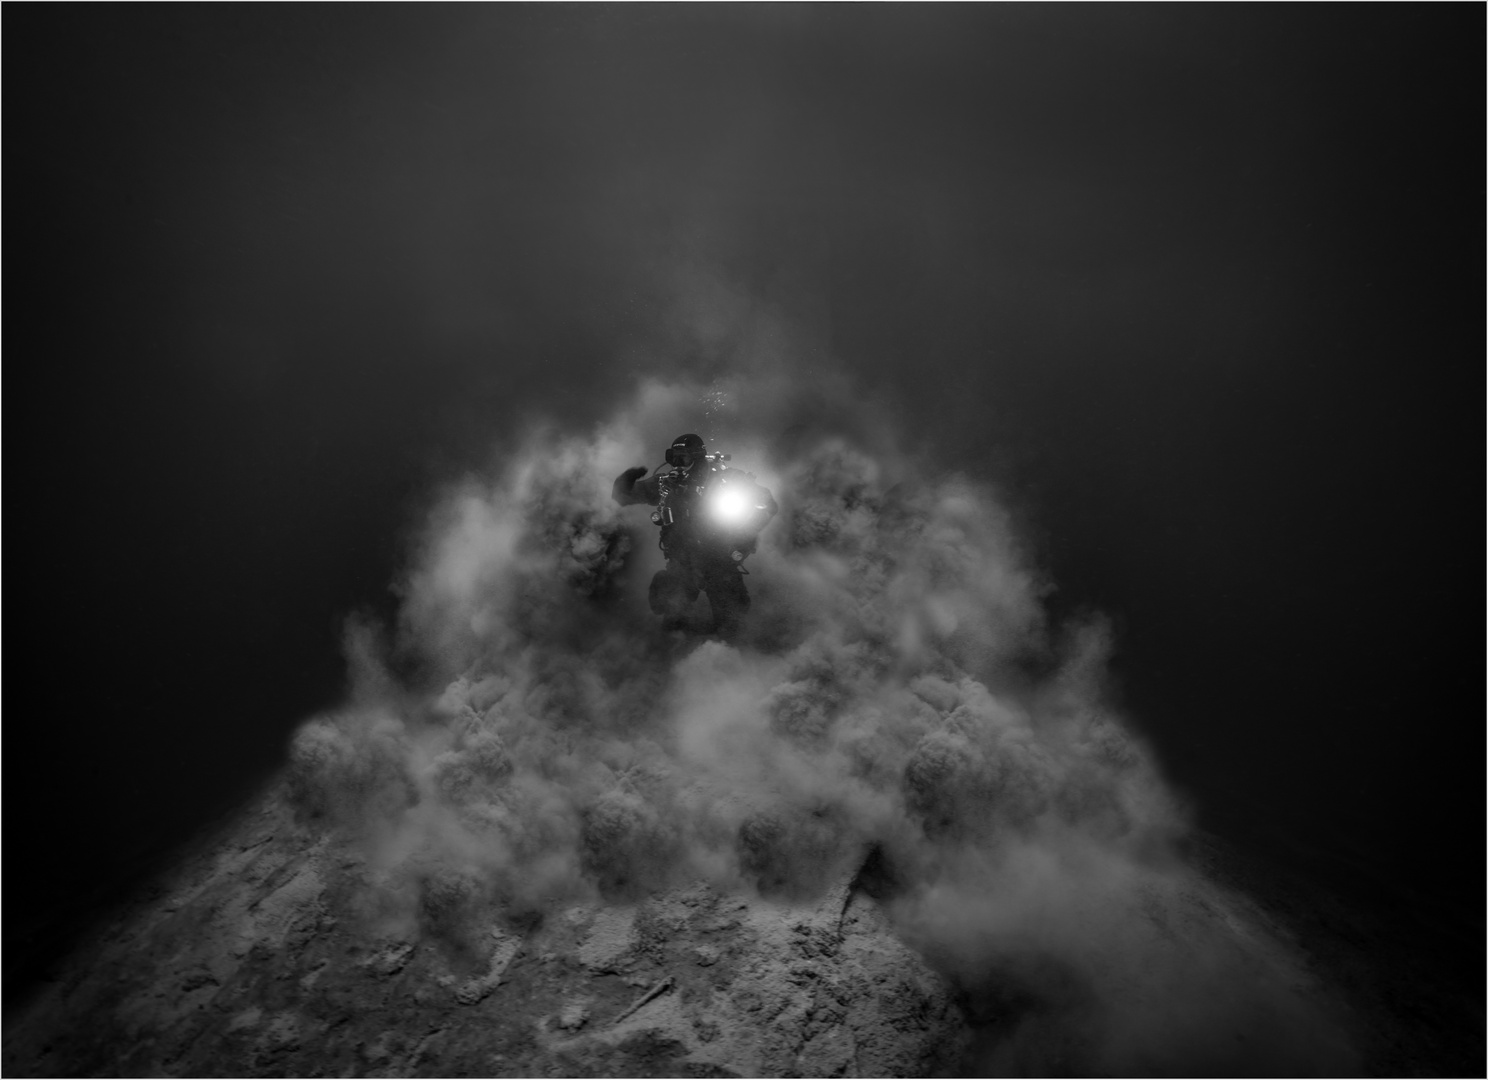 Der Tanz auf dem Vulkan